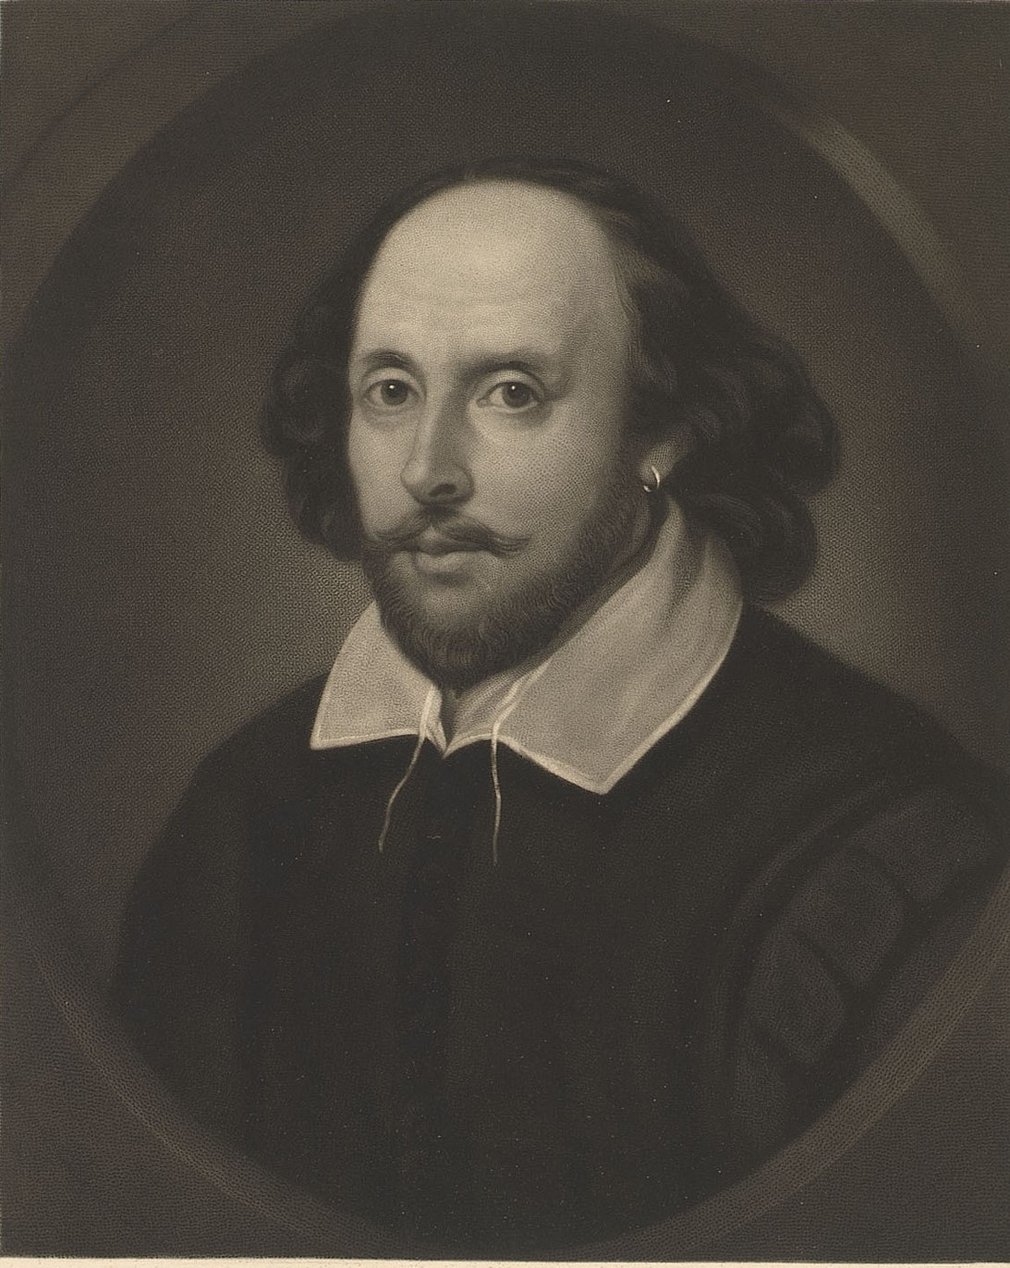 Engraved portrait of William Shakespeare